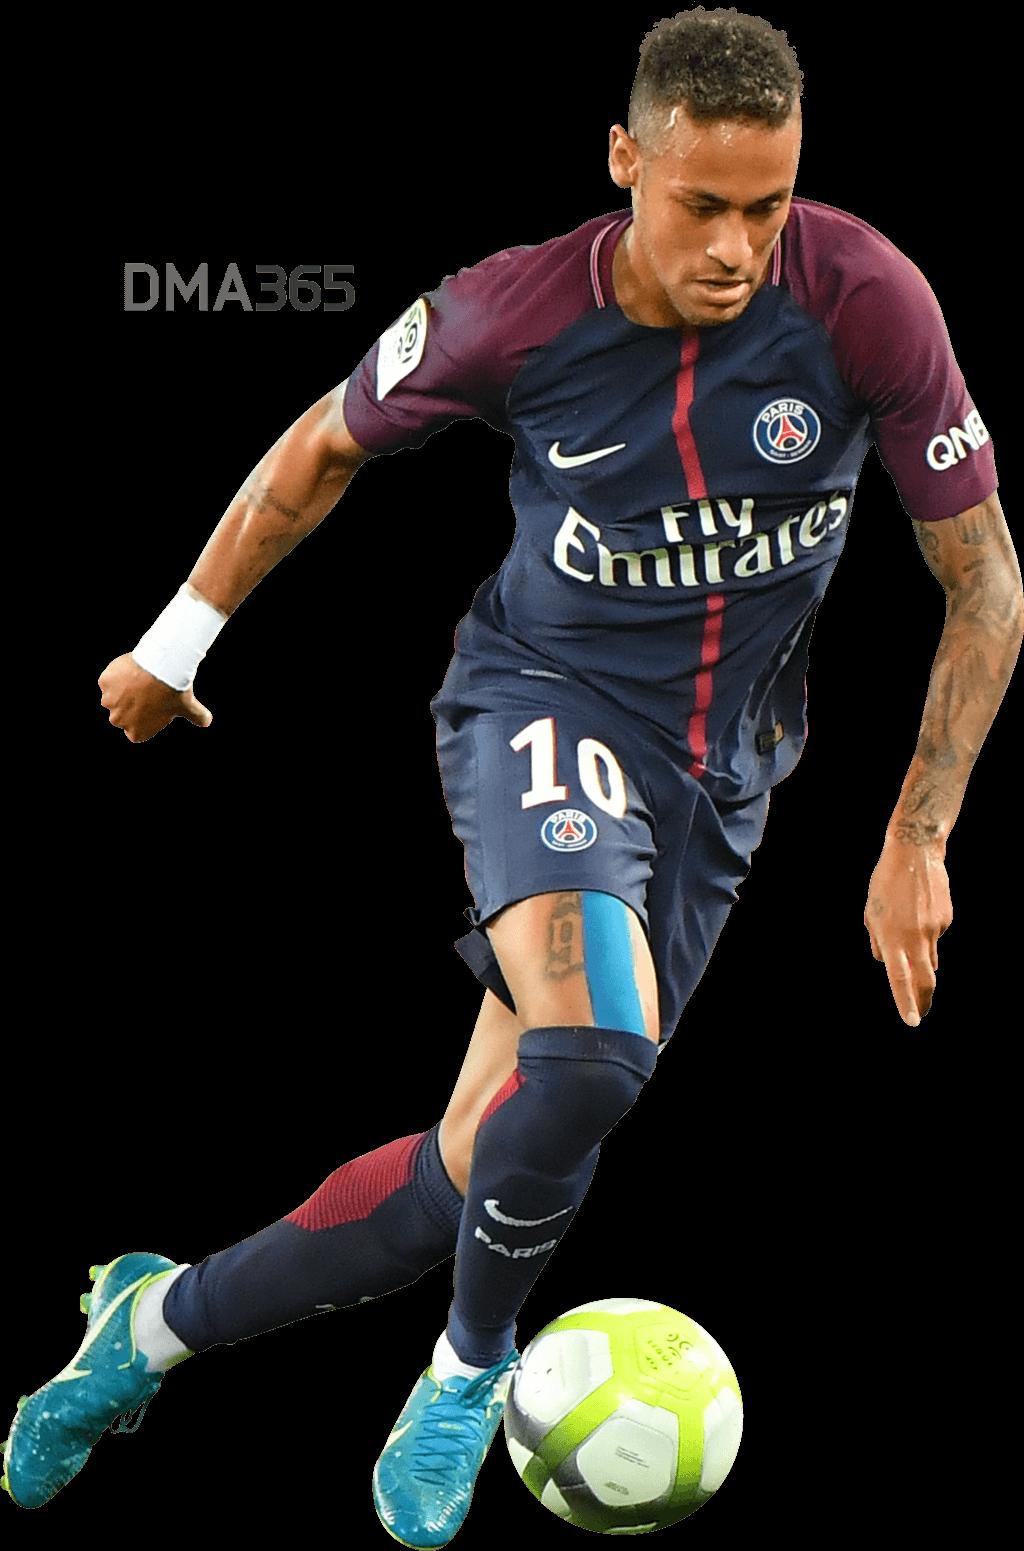 Neymar Png Psg 2018 By Dma365